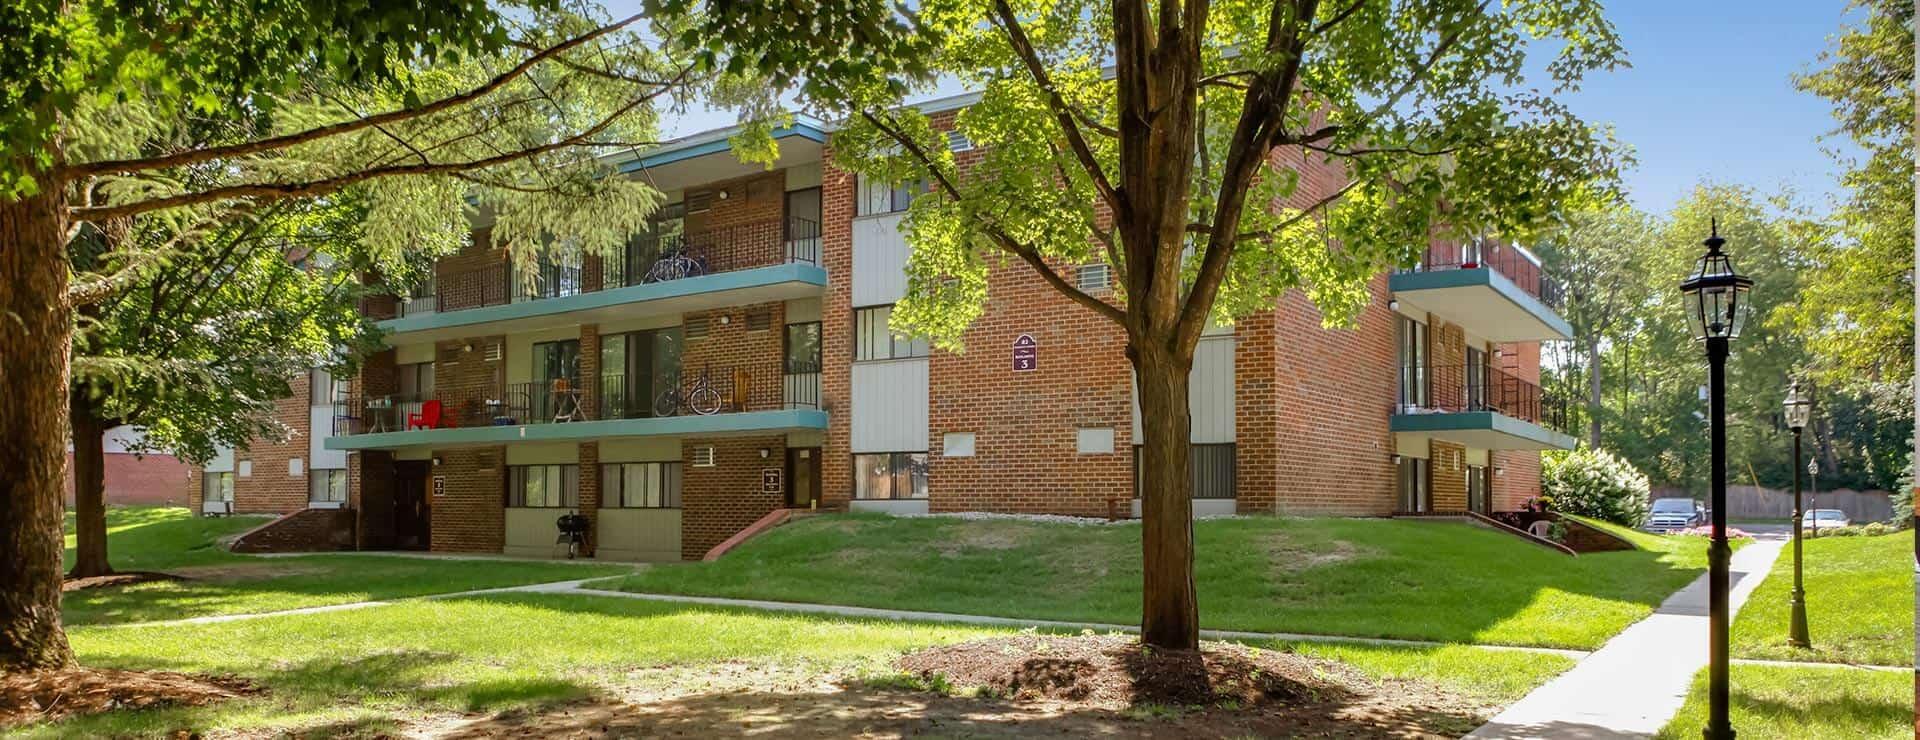 Burns Management | Whitmore Court Apartments Saratoga